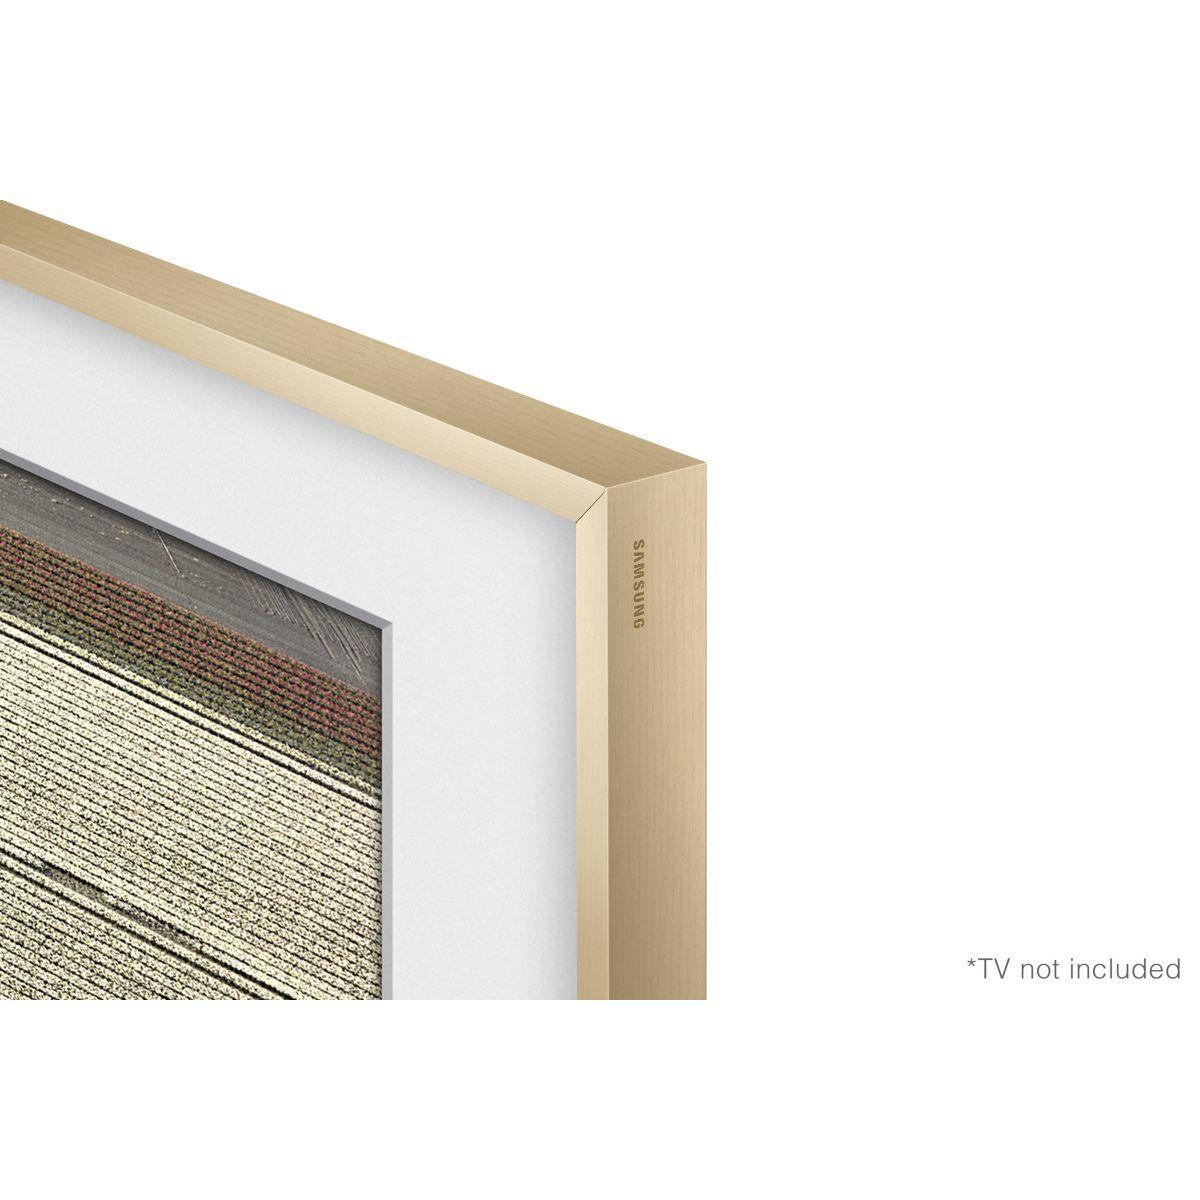 Cadre the frame samsung cadre vg-scfm55lw the frame light wood - 10% de remise imm�diate avec le code : fete10 (photo)